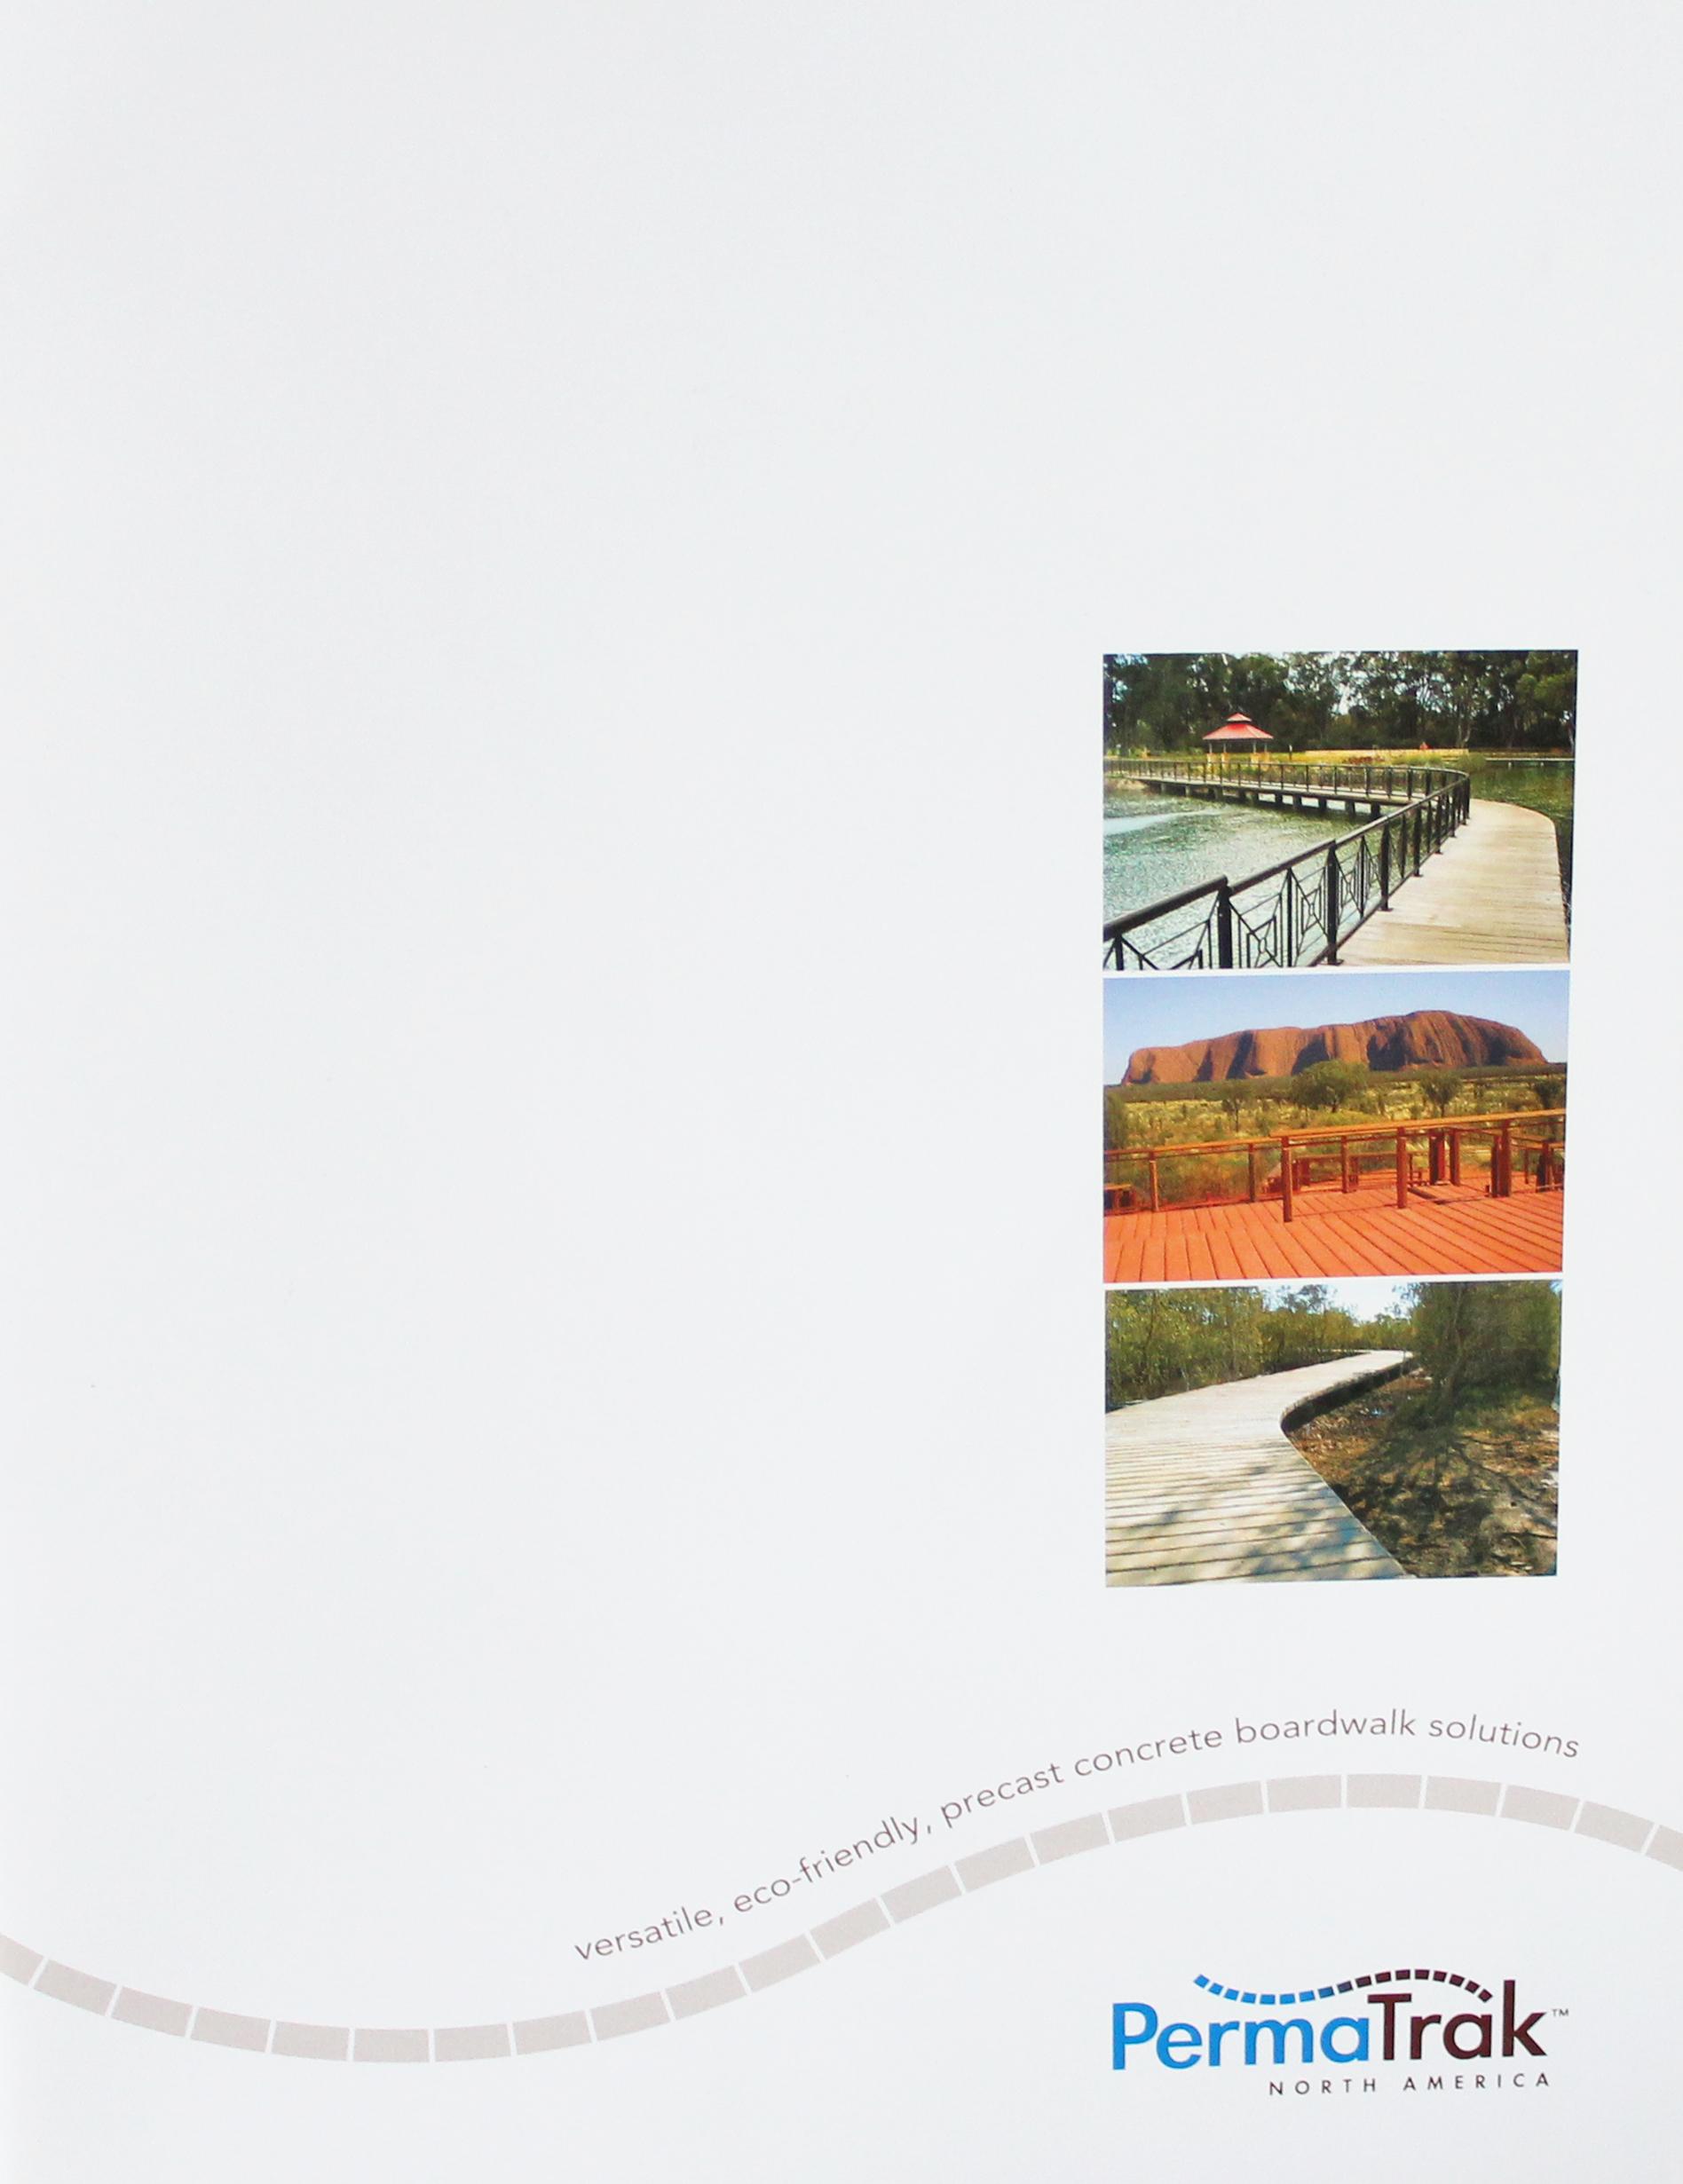 literature-brochure-permatrak-for-home-page---new-2